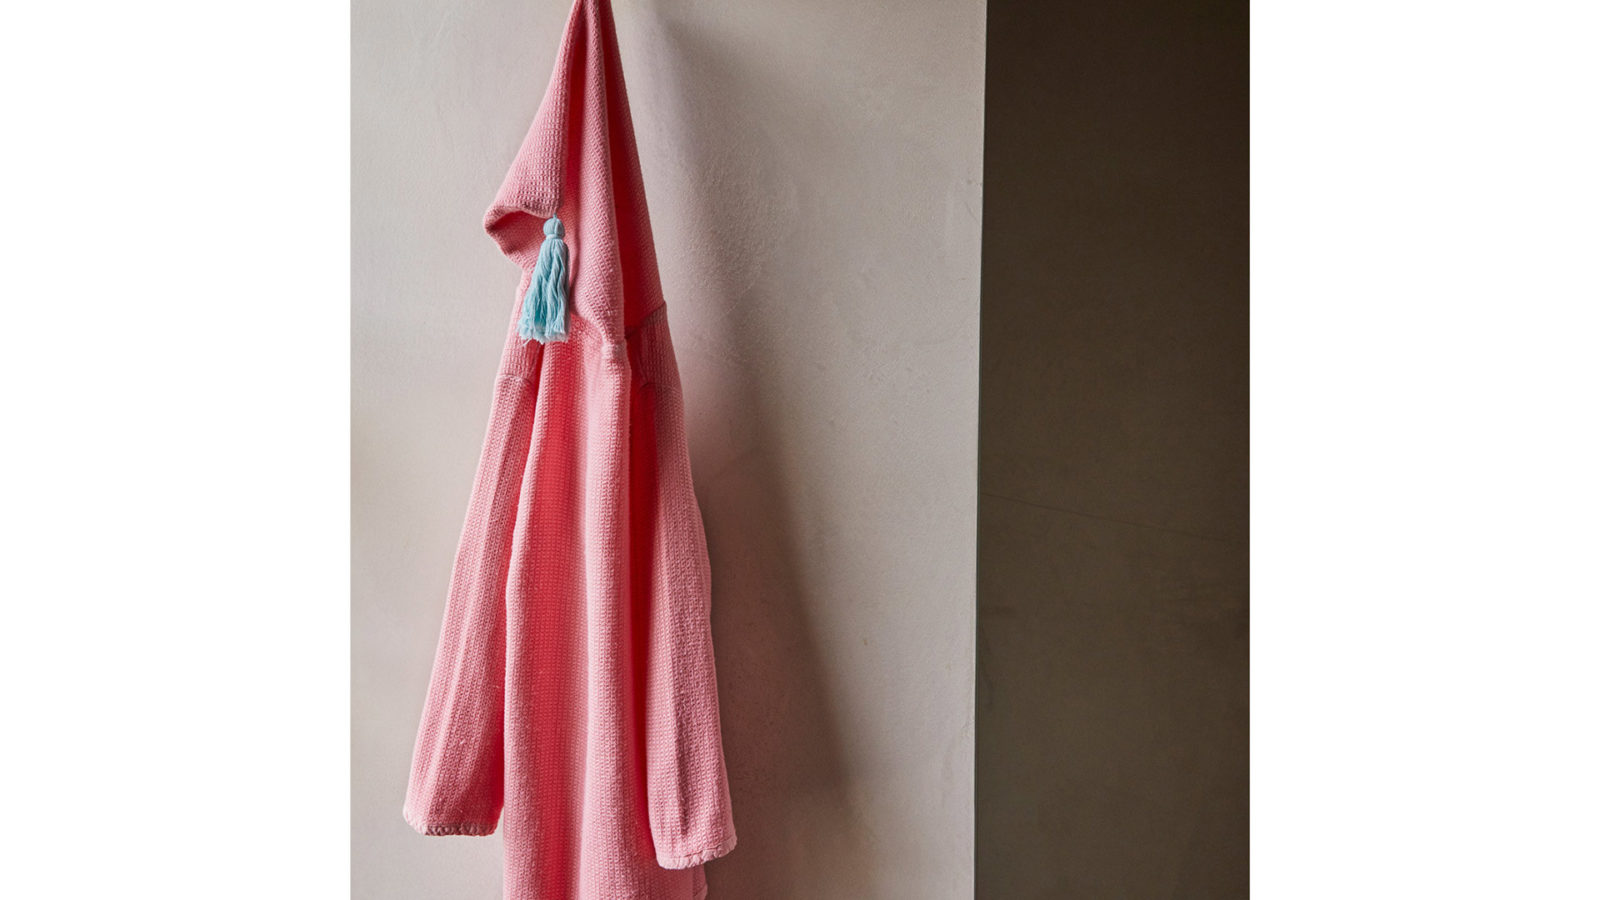 Child's-Cotton-Robe-pinky-with-aqua-tassle